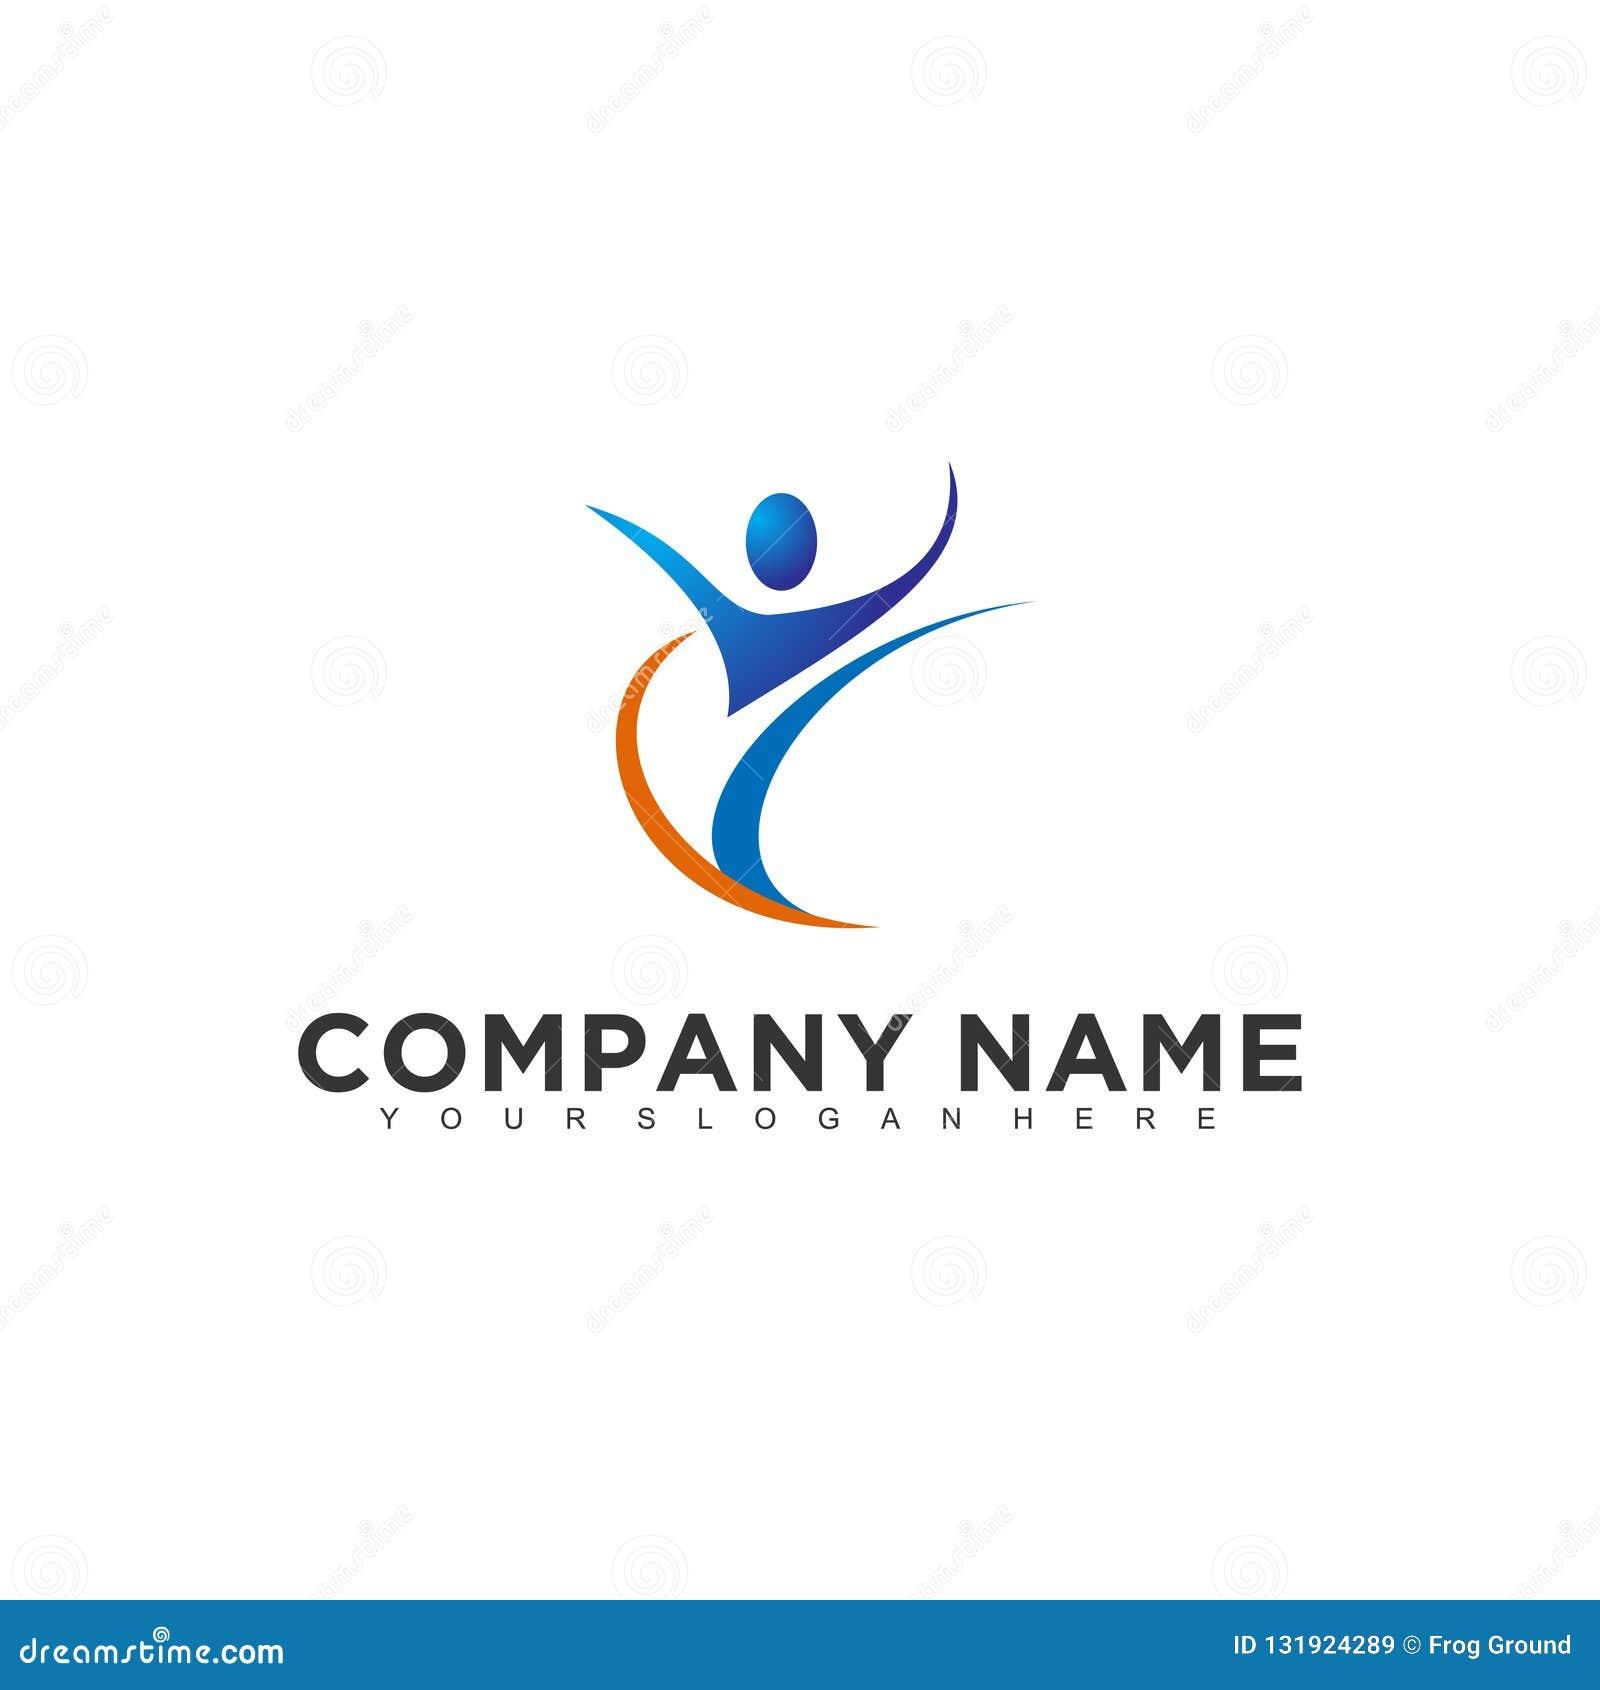 Simple Minimalistic Modern Professional Logo Design Of Nature Medical Vector Eps Illustrator Template Stock Vector Illustration Of Corporate Health 131924289